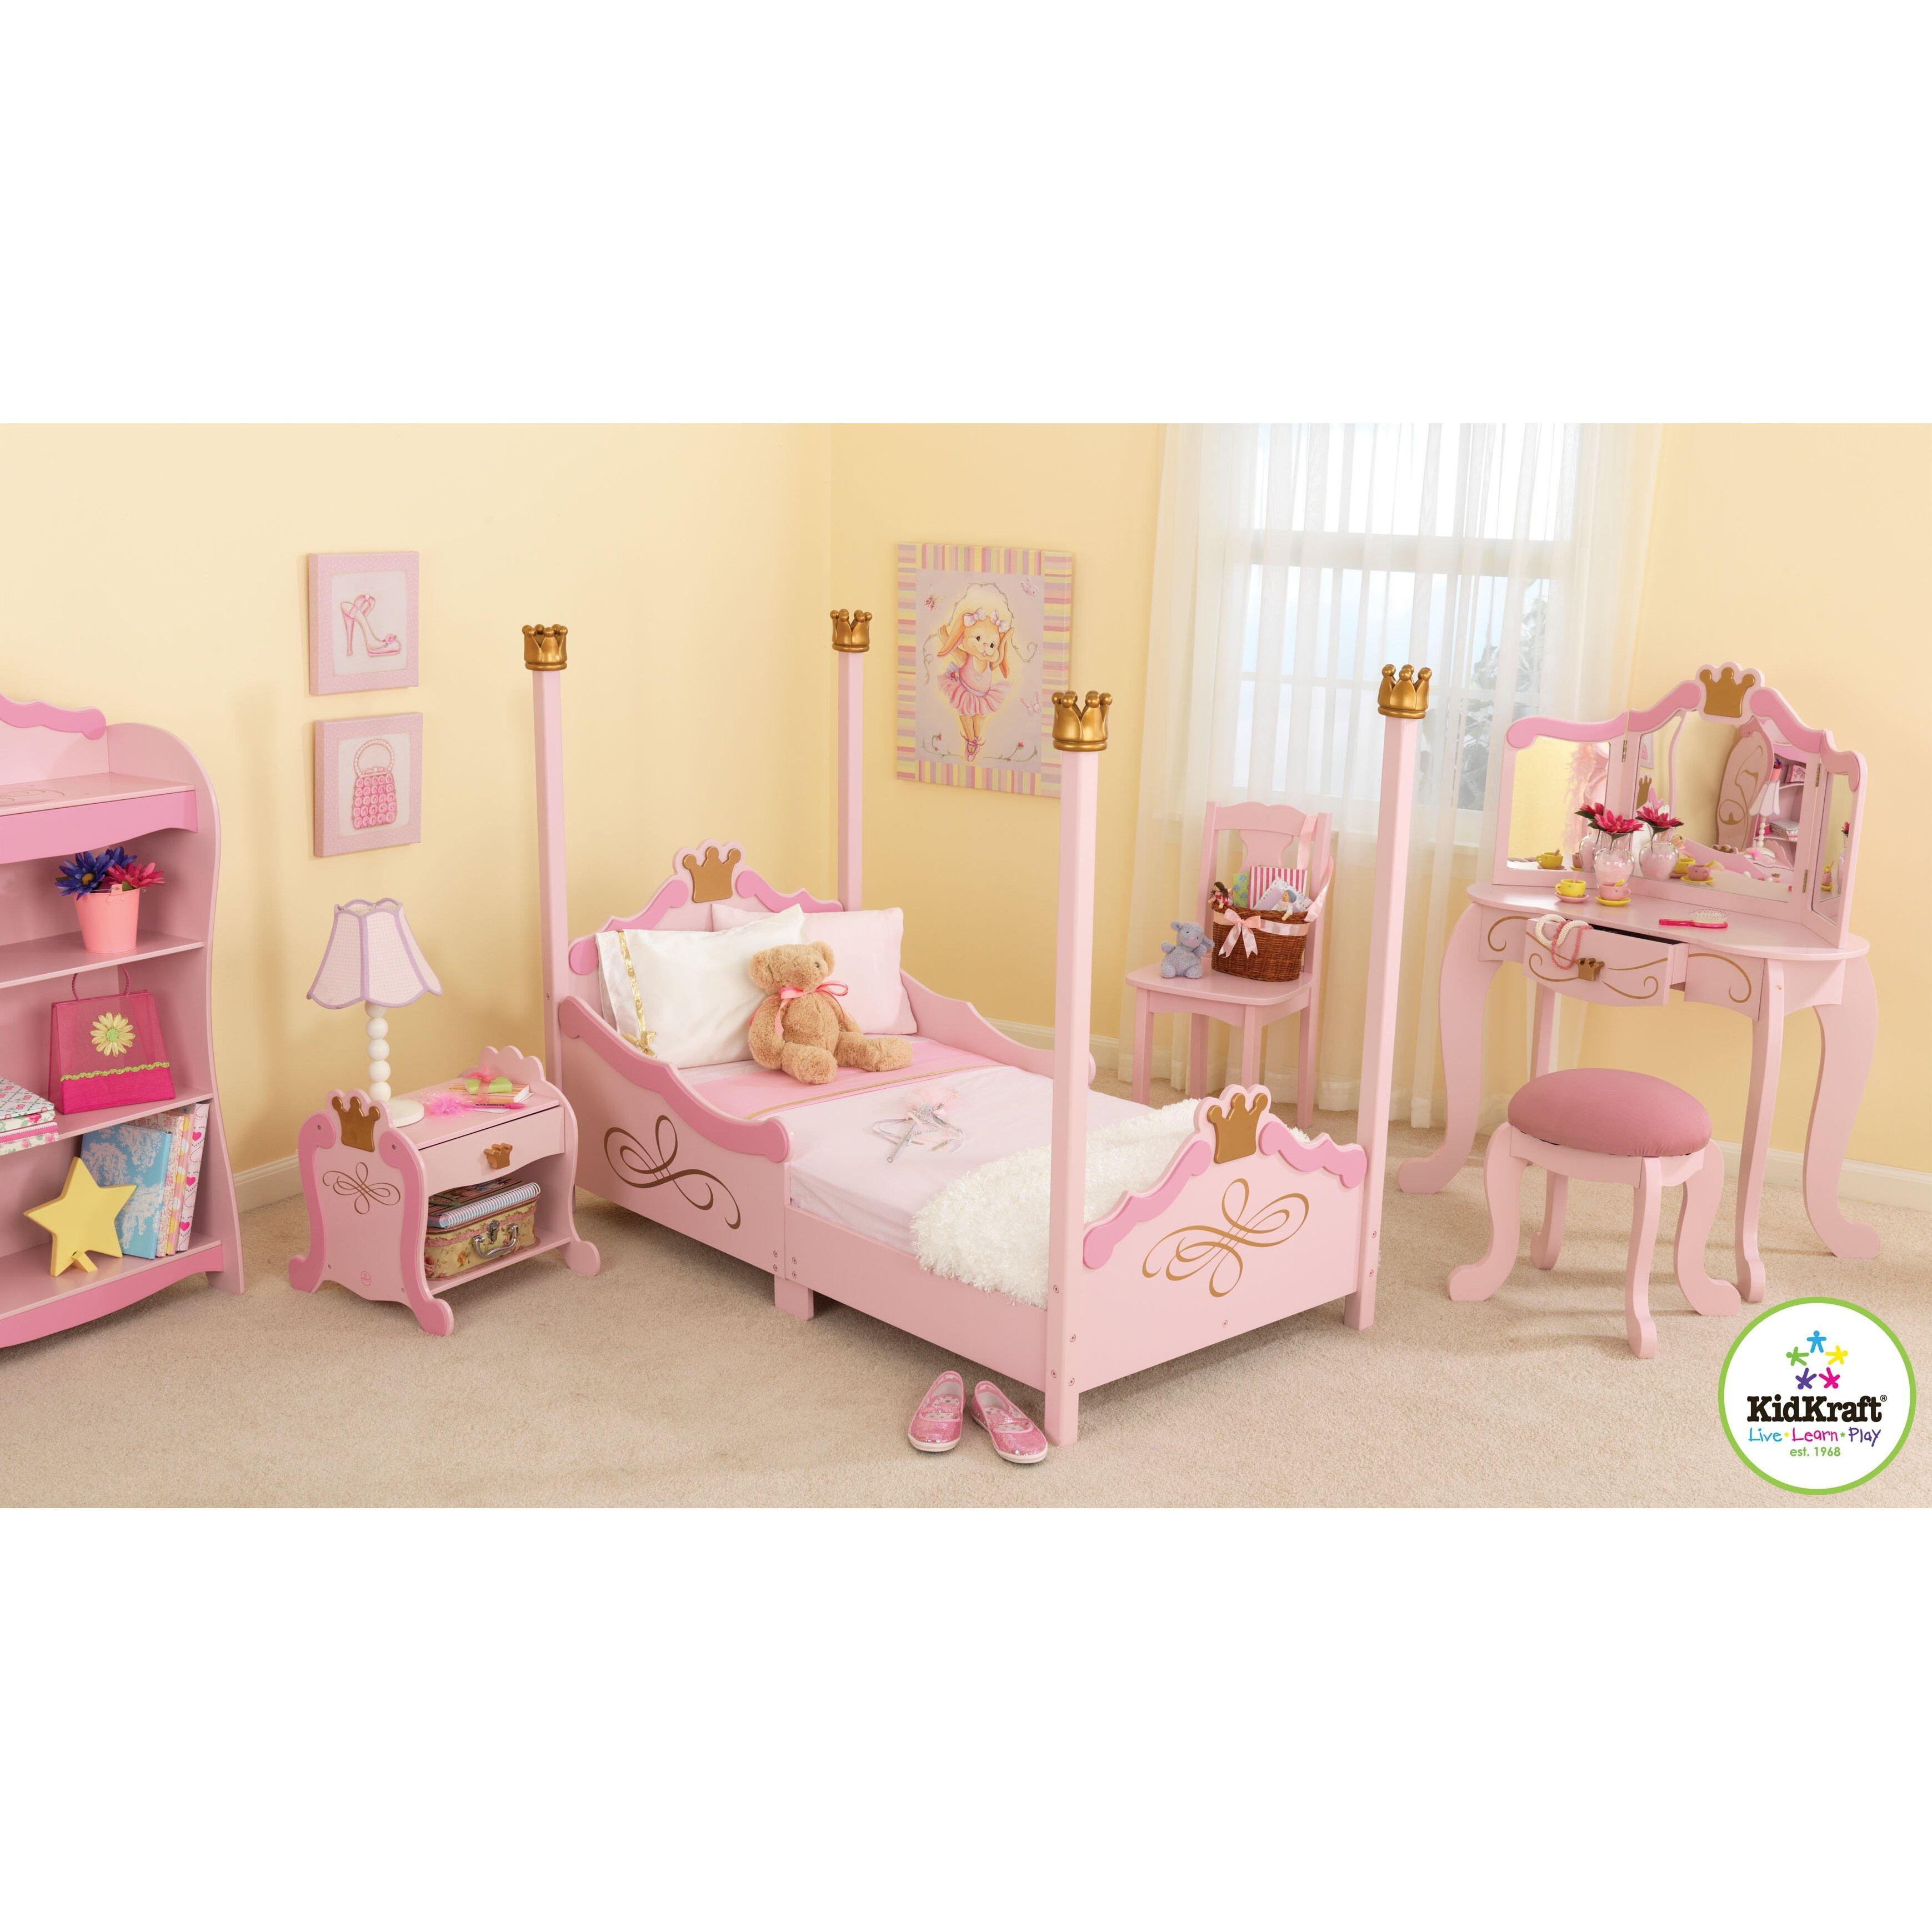 Princess Bedroom For Girls: KidKraft Princess Toddler Four Poster Customizable Bedroom